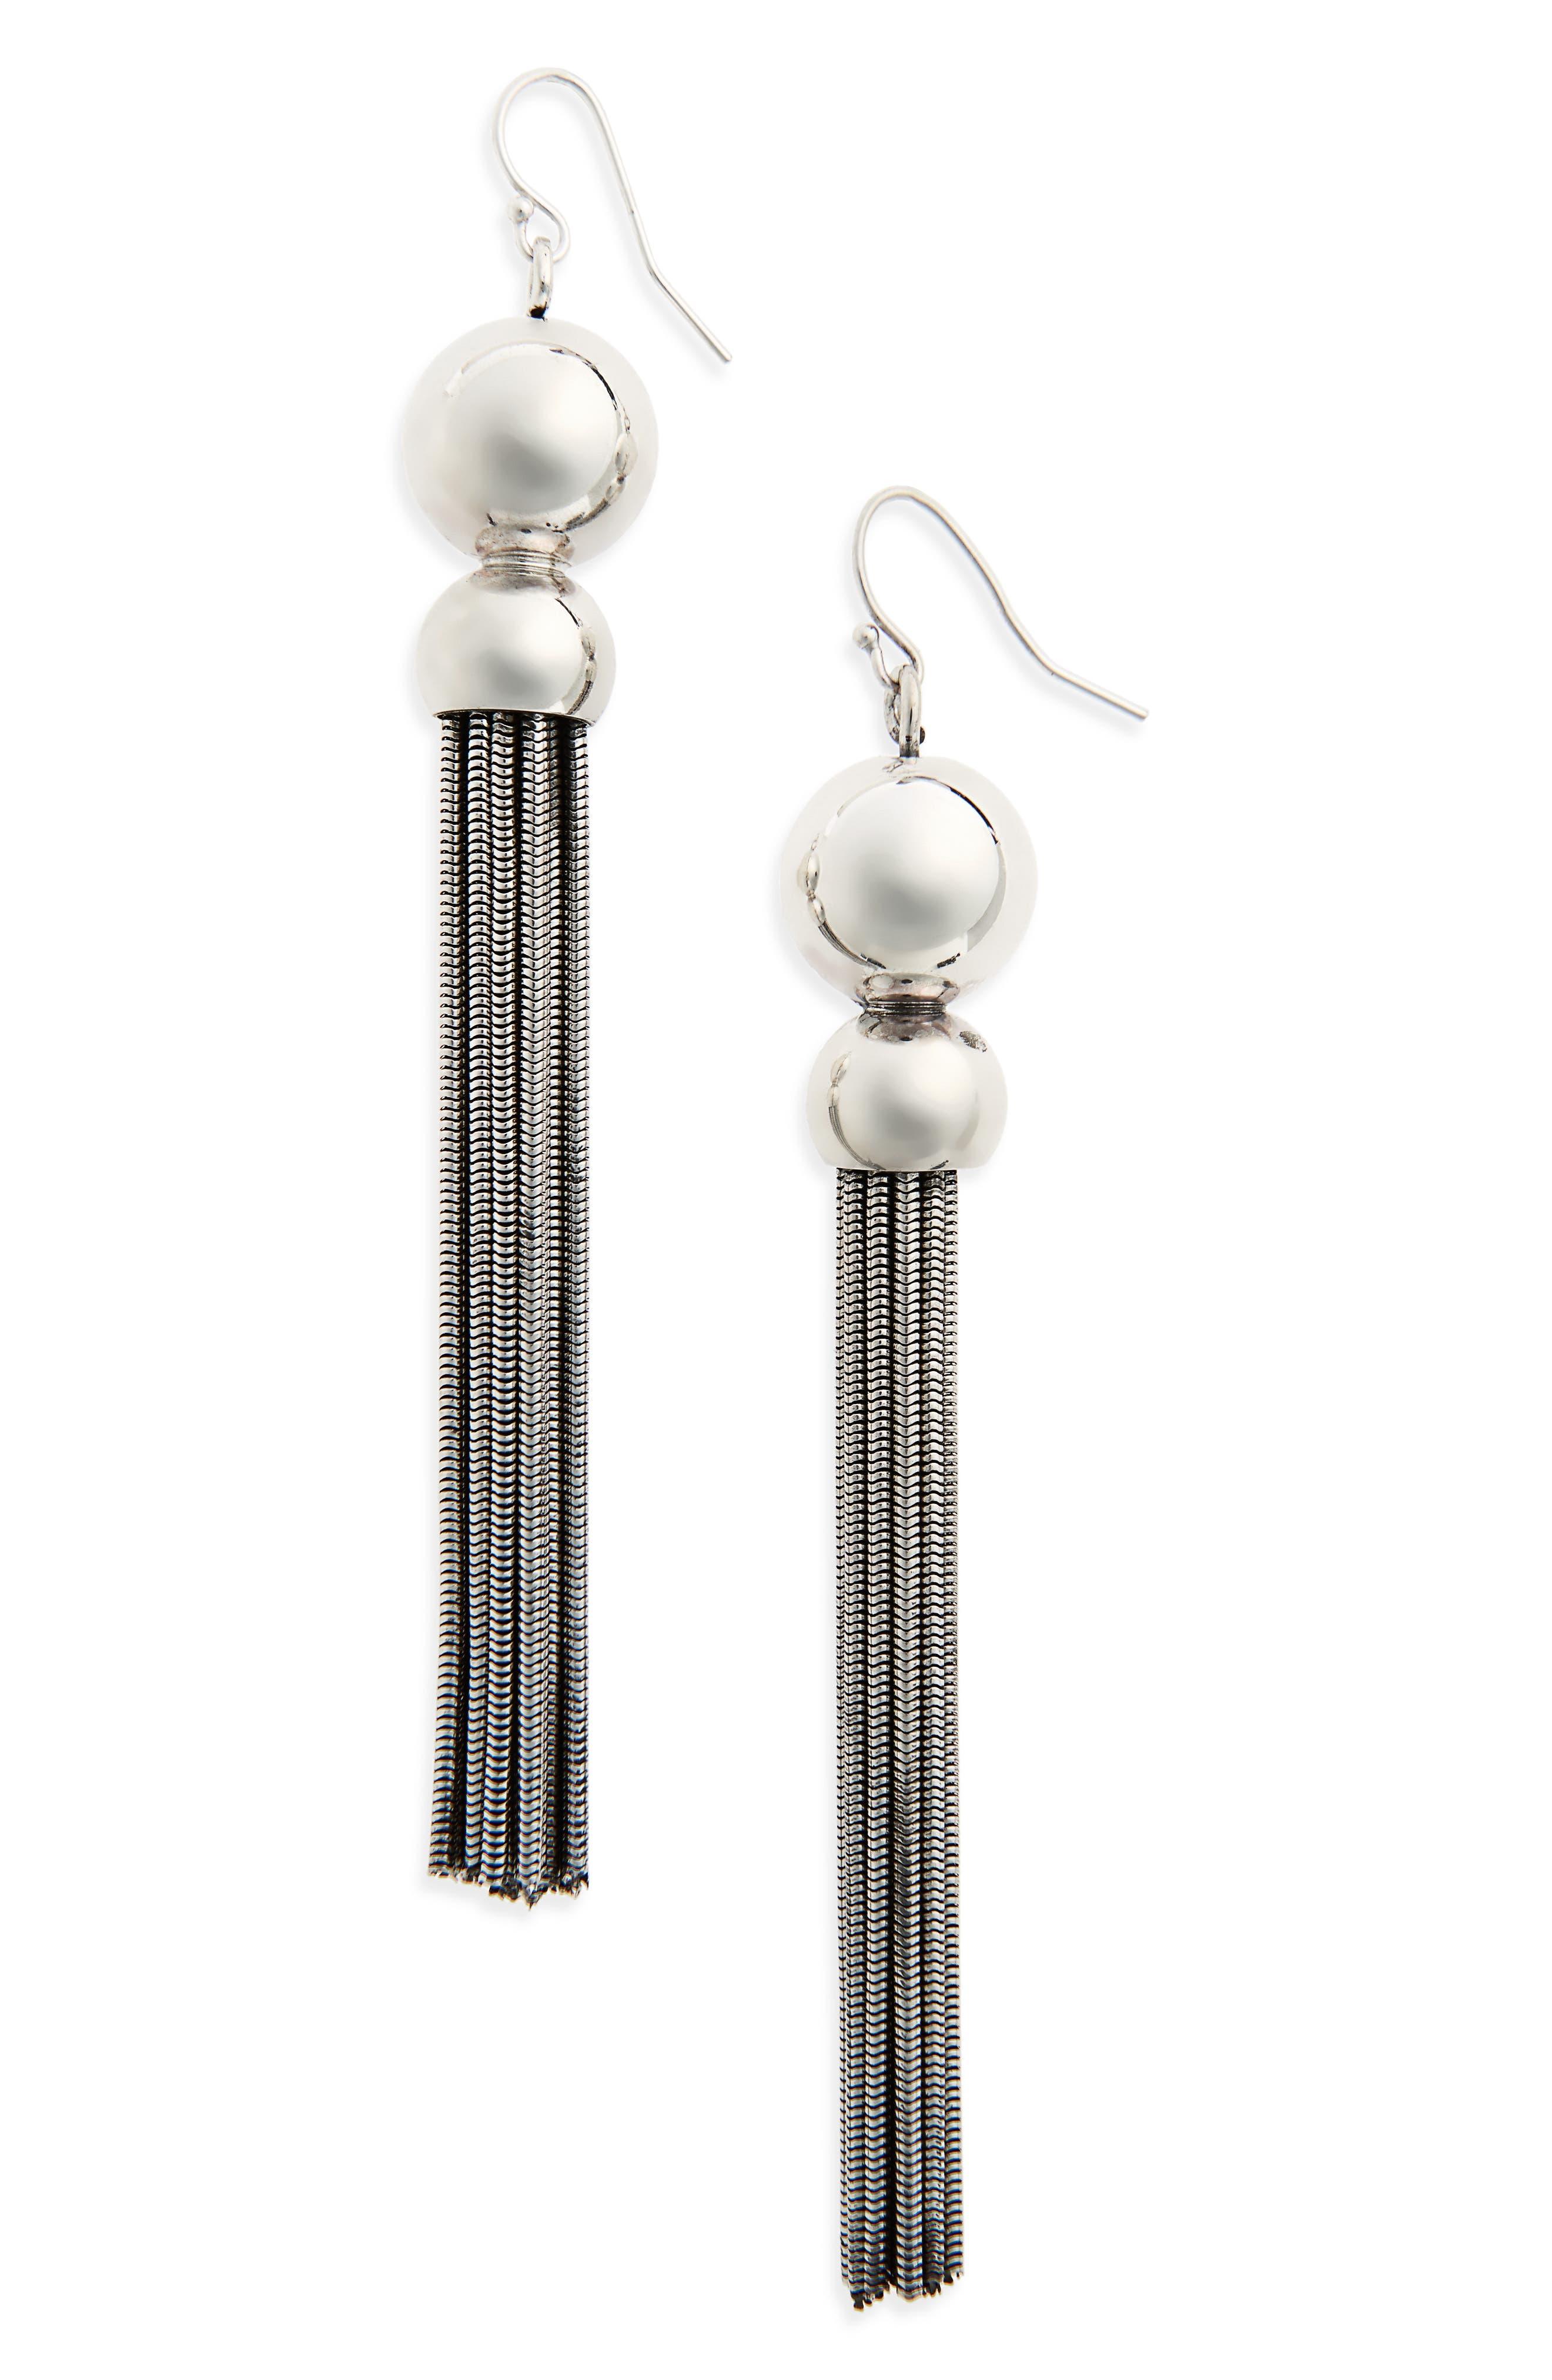 Sophie Buhai Benton Gates Silver Tassel Statement Earrings